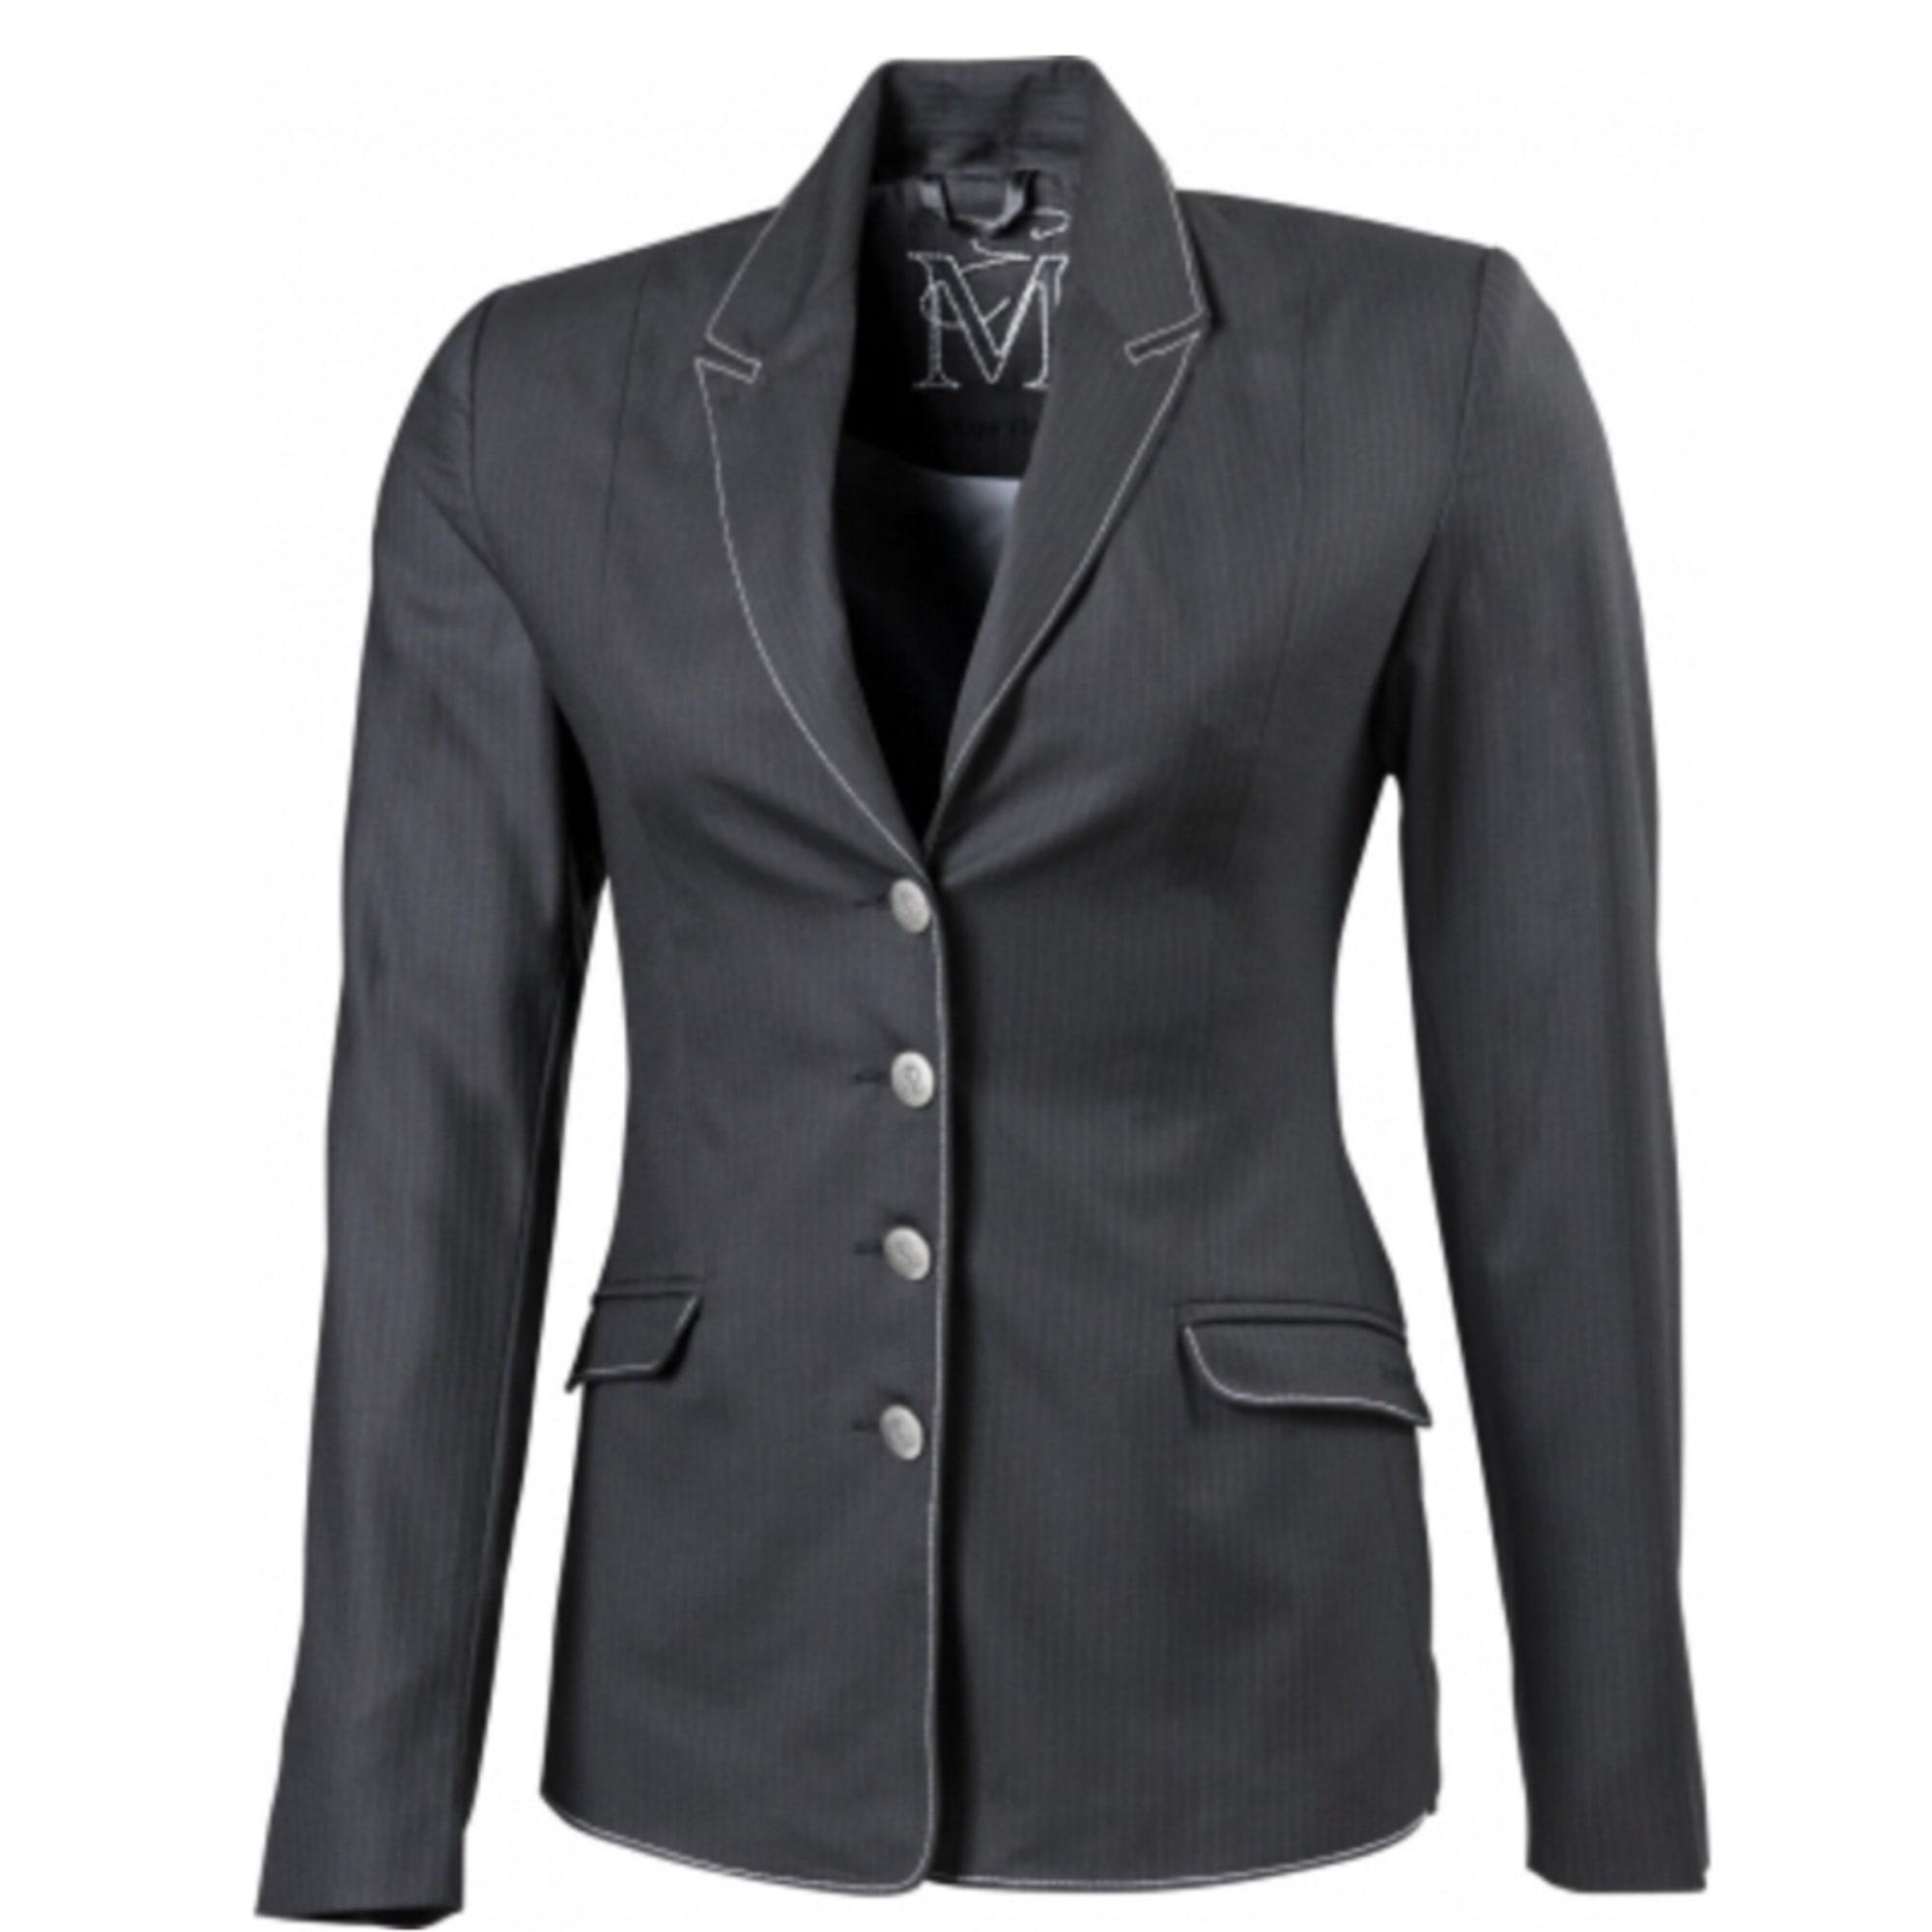 Blazer, veste tailleur EQUI-THÈME Noir